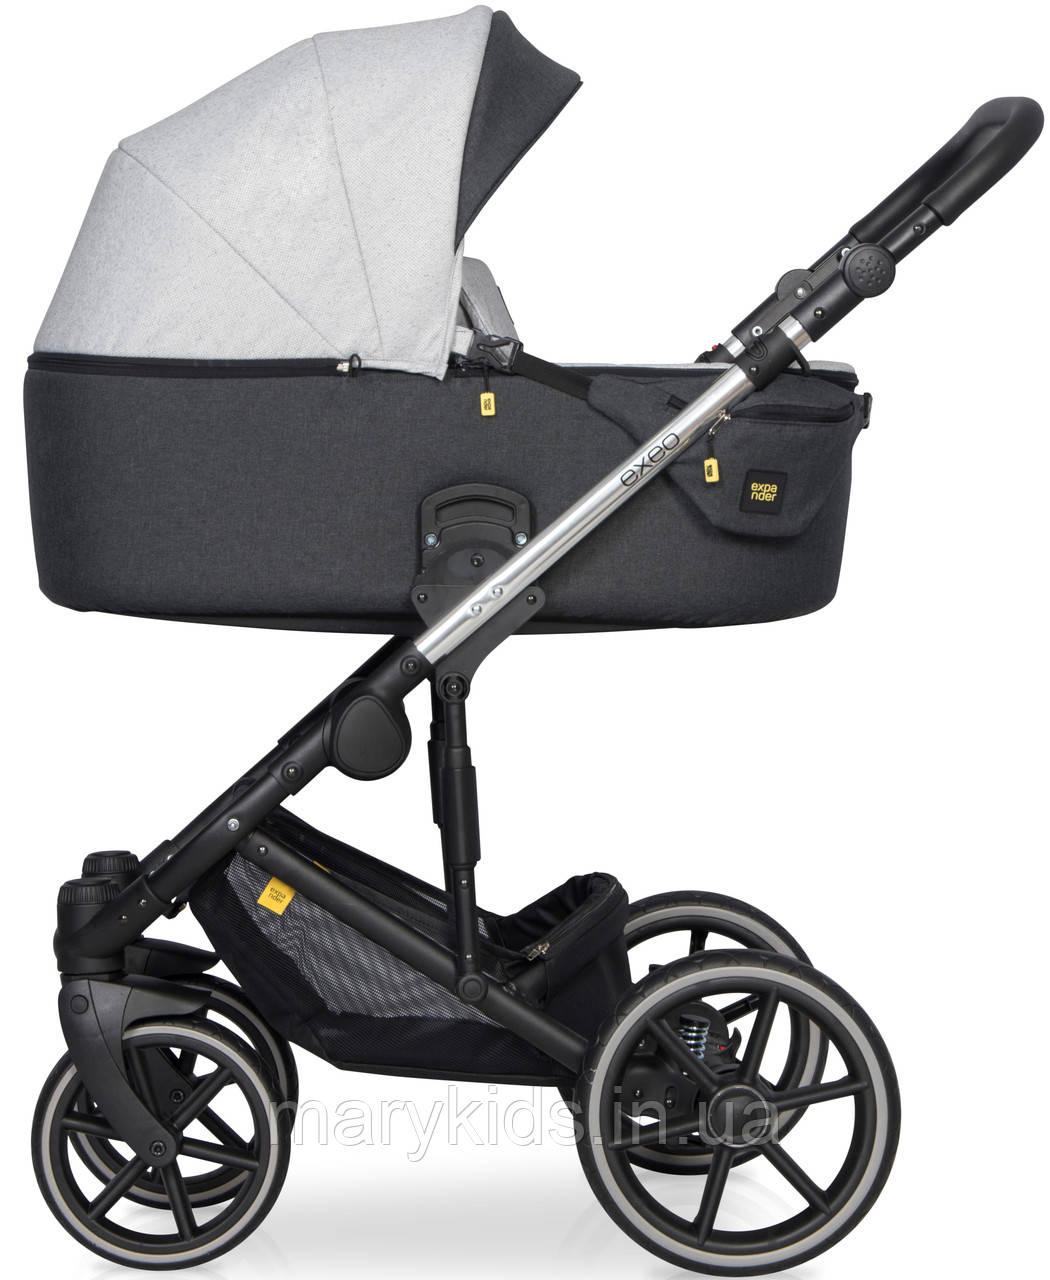 Дитяча універсальна коляска 3 в 1 Riko Exeo 01 Silver